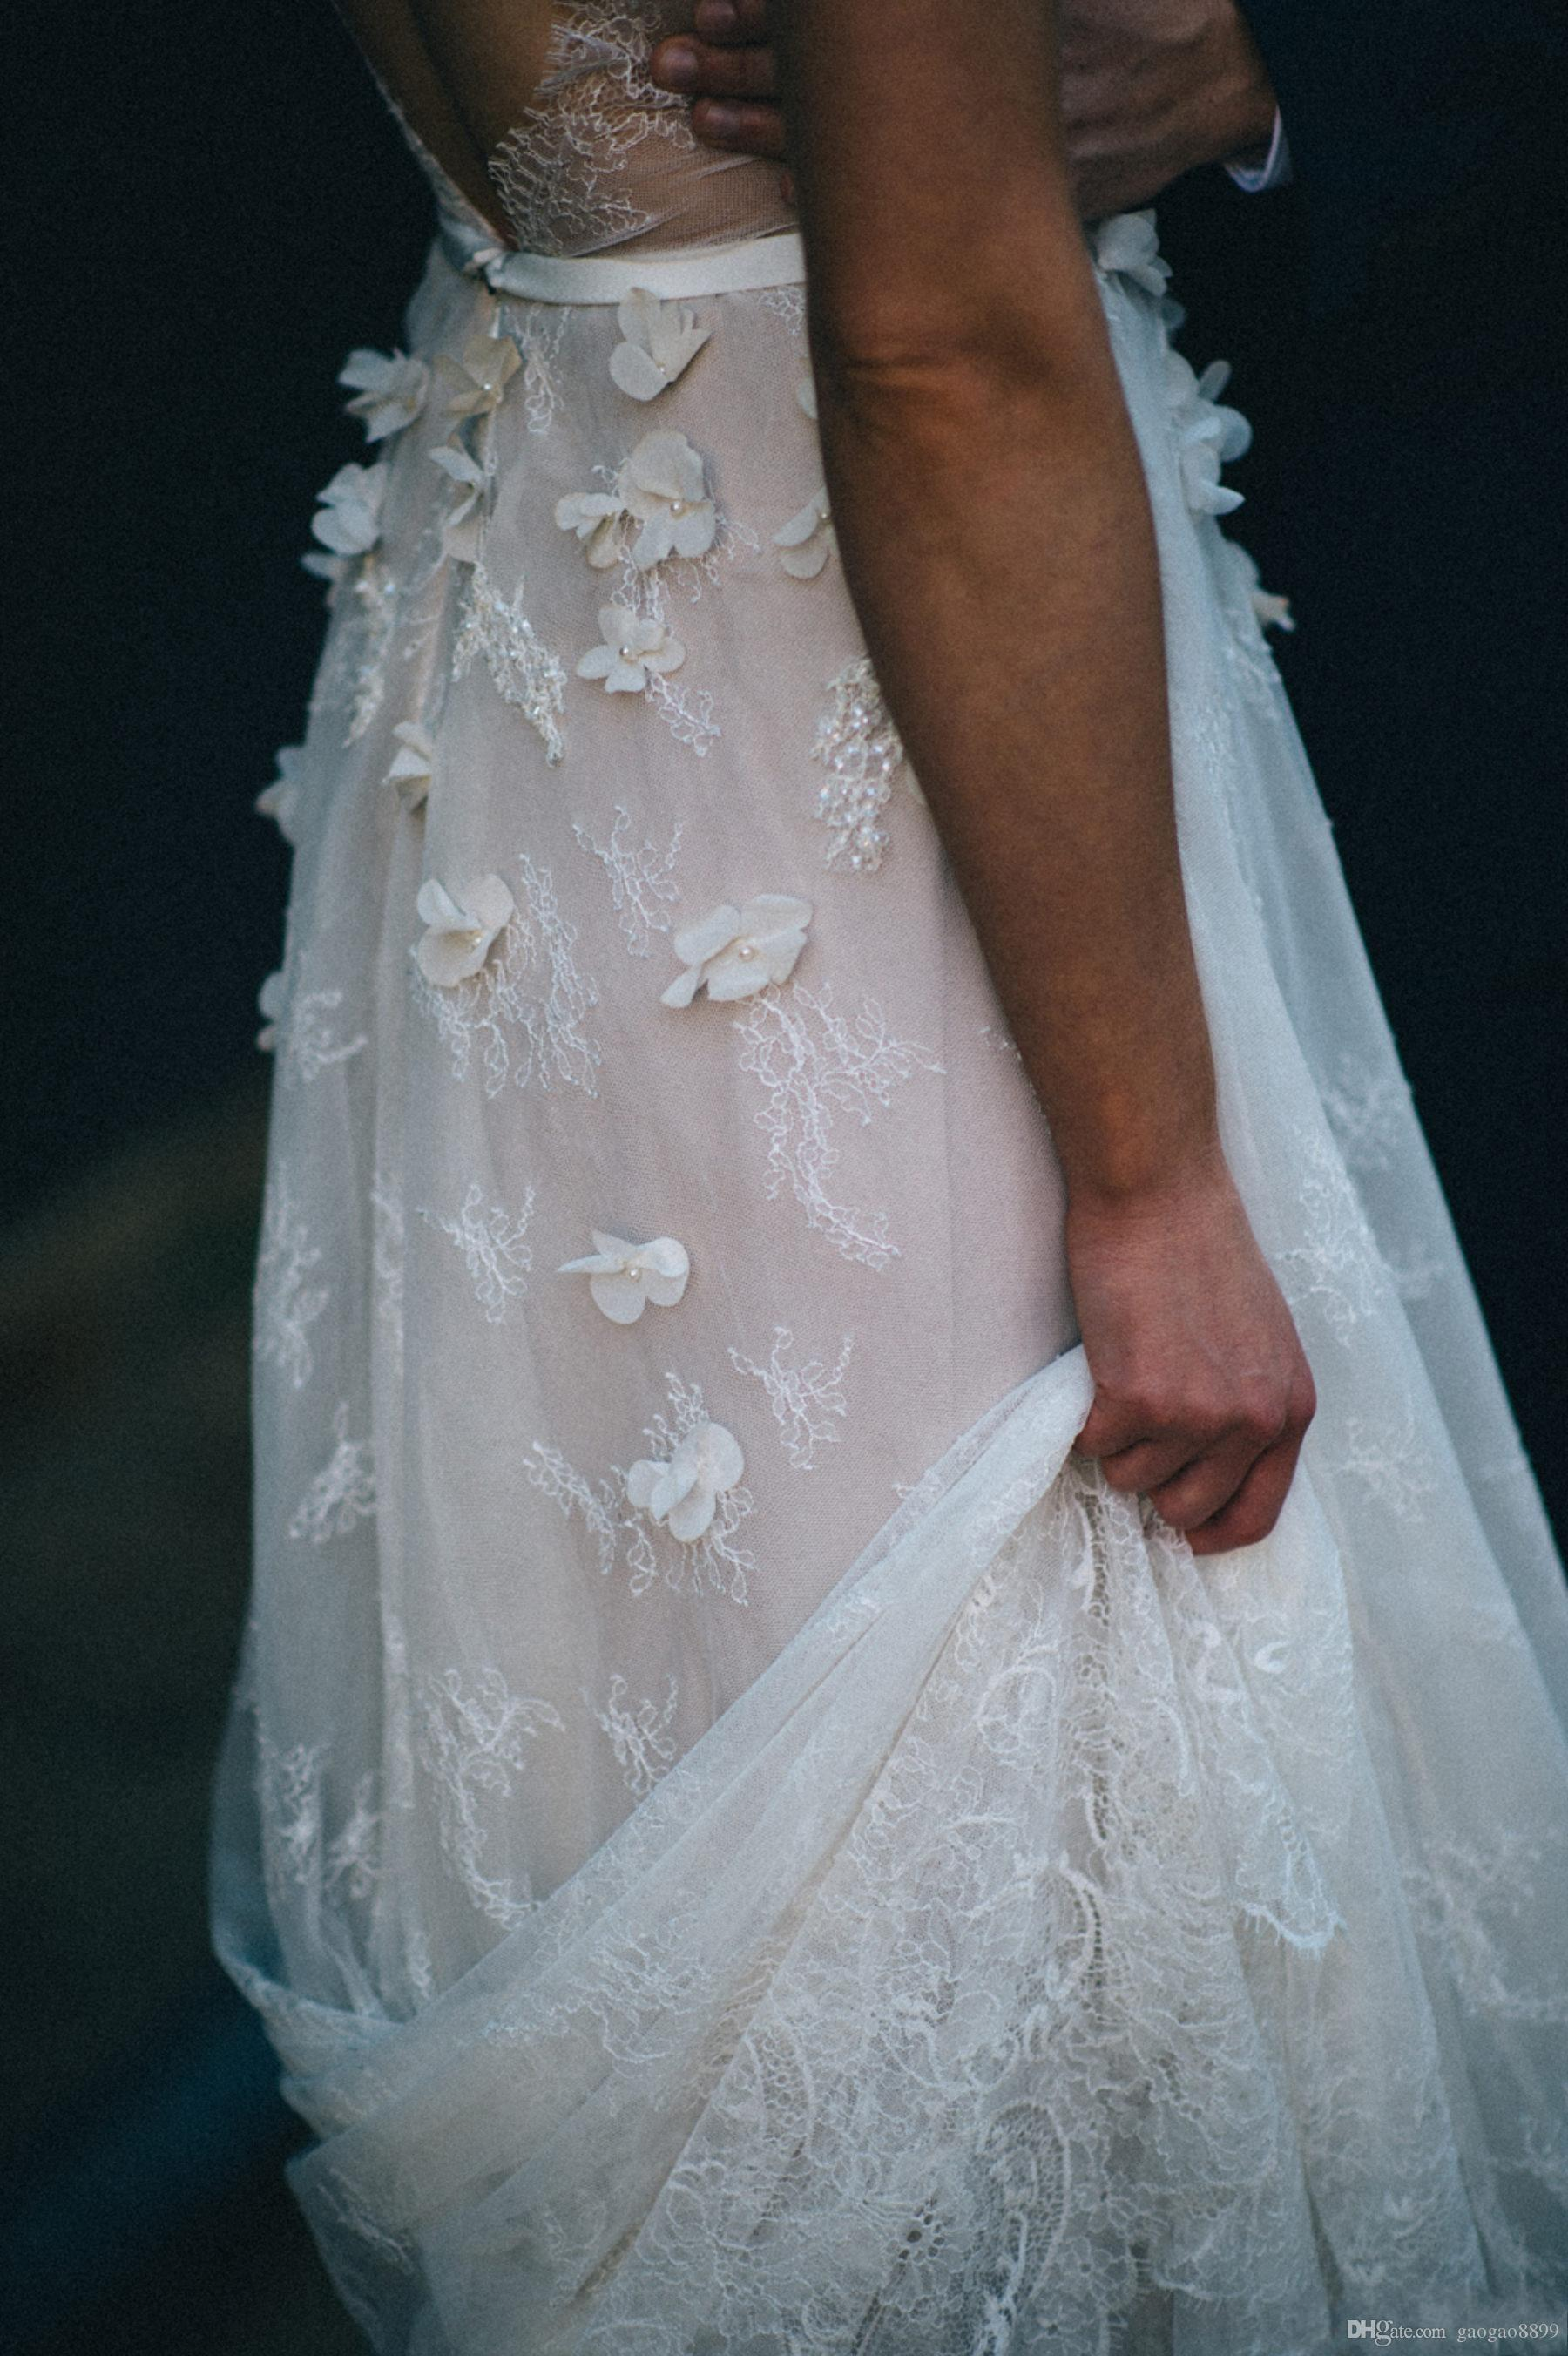 2019 estilo country lace vestidos de casamento vestidos de noiva mangas curtas pérolas 3d flor praia vestido de noiva vestidos de casamento boêmio